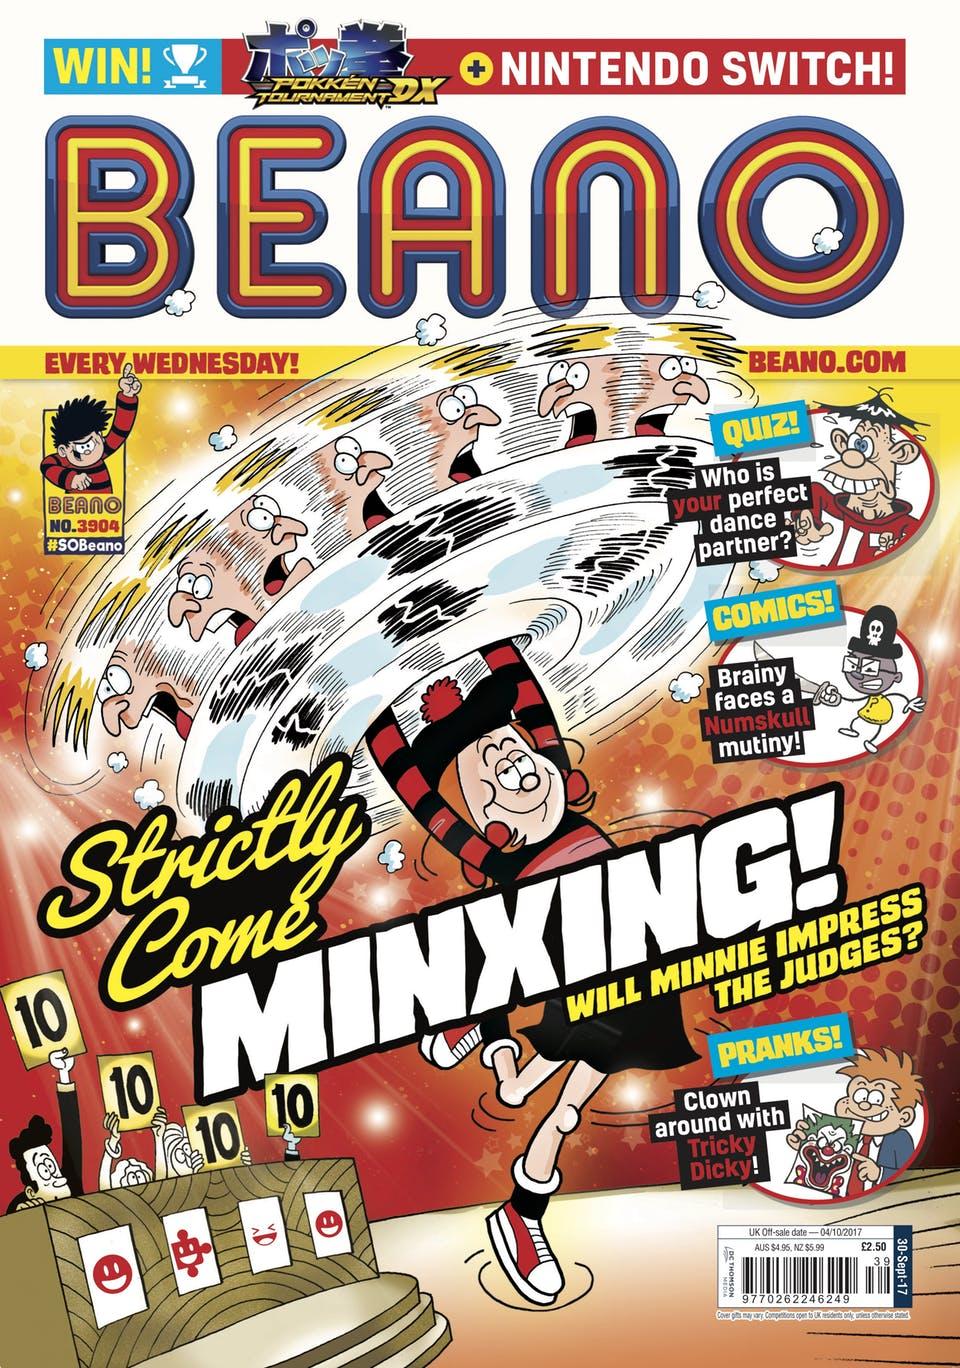 Beano 3904 - Cover